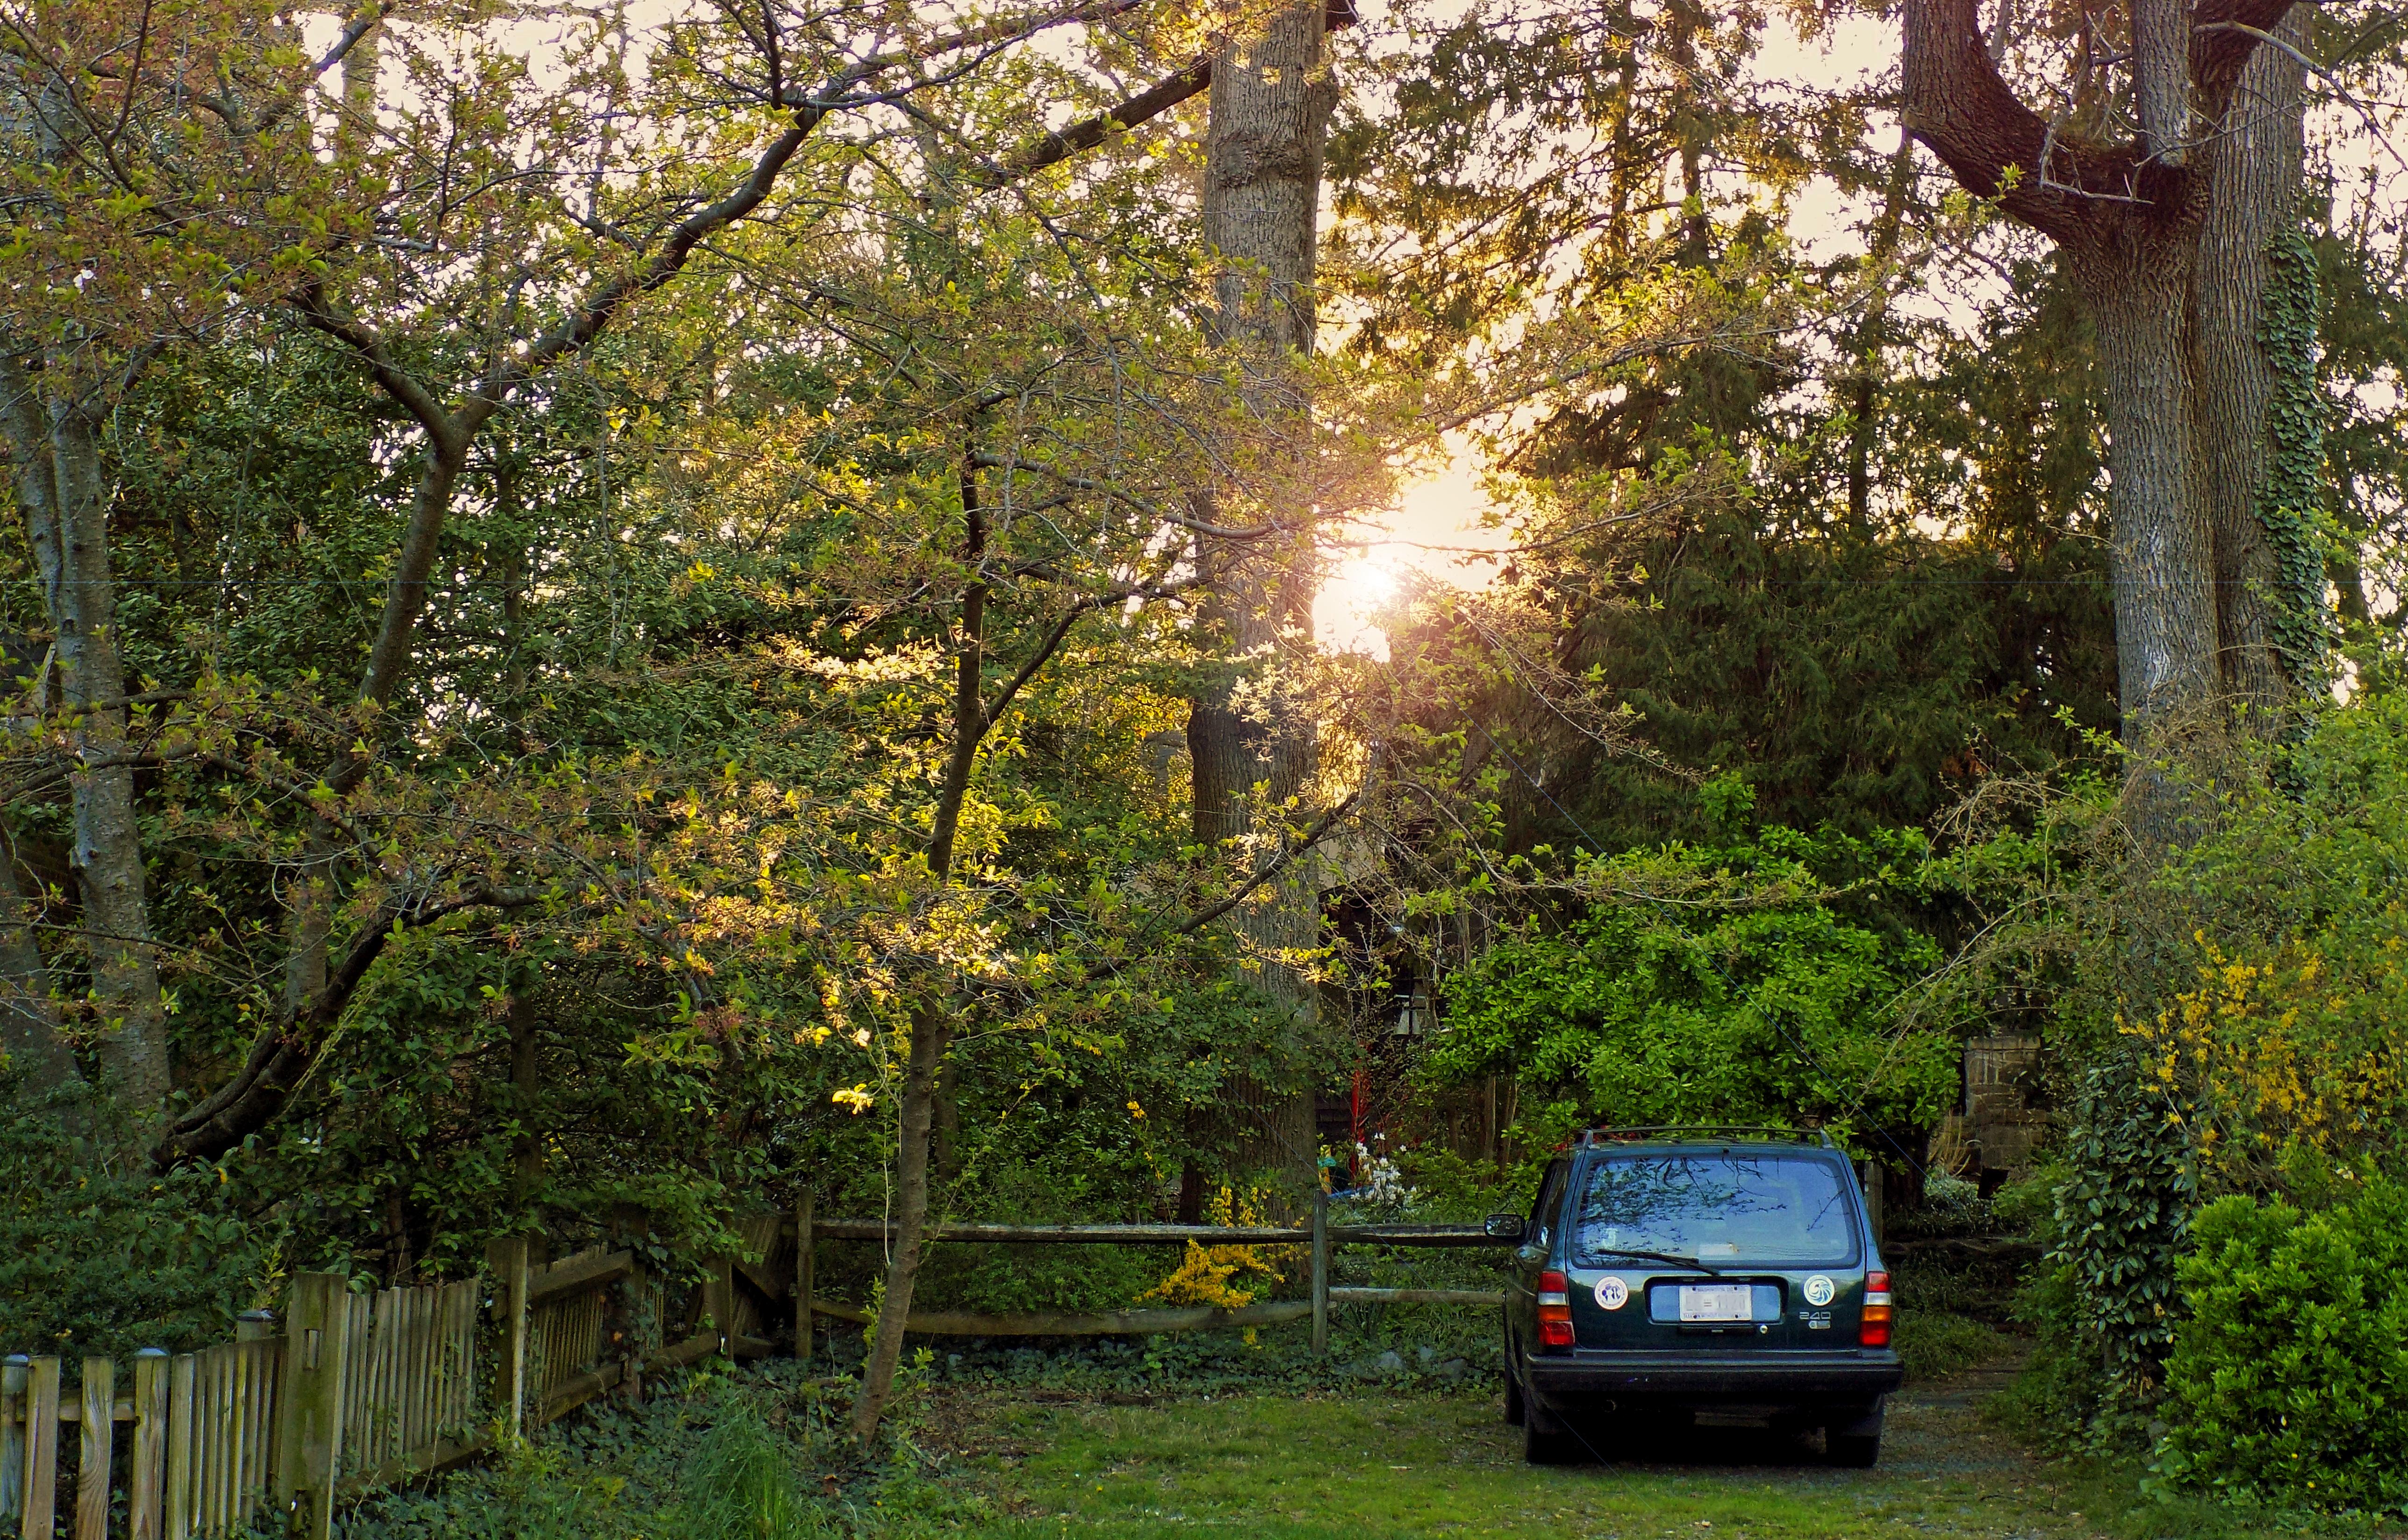 Best Parking Spot, Fence, Nature, Outdoor, Parking, HQ Photo